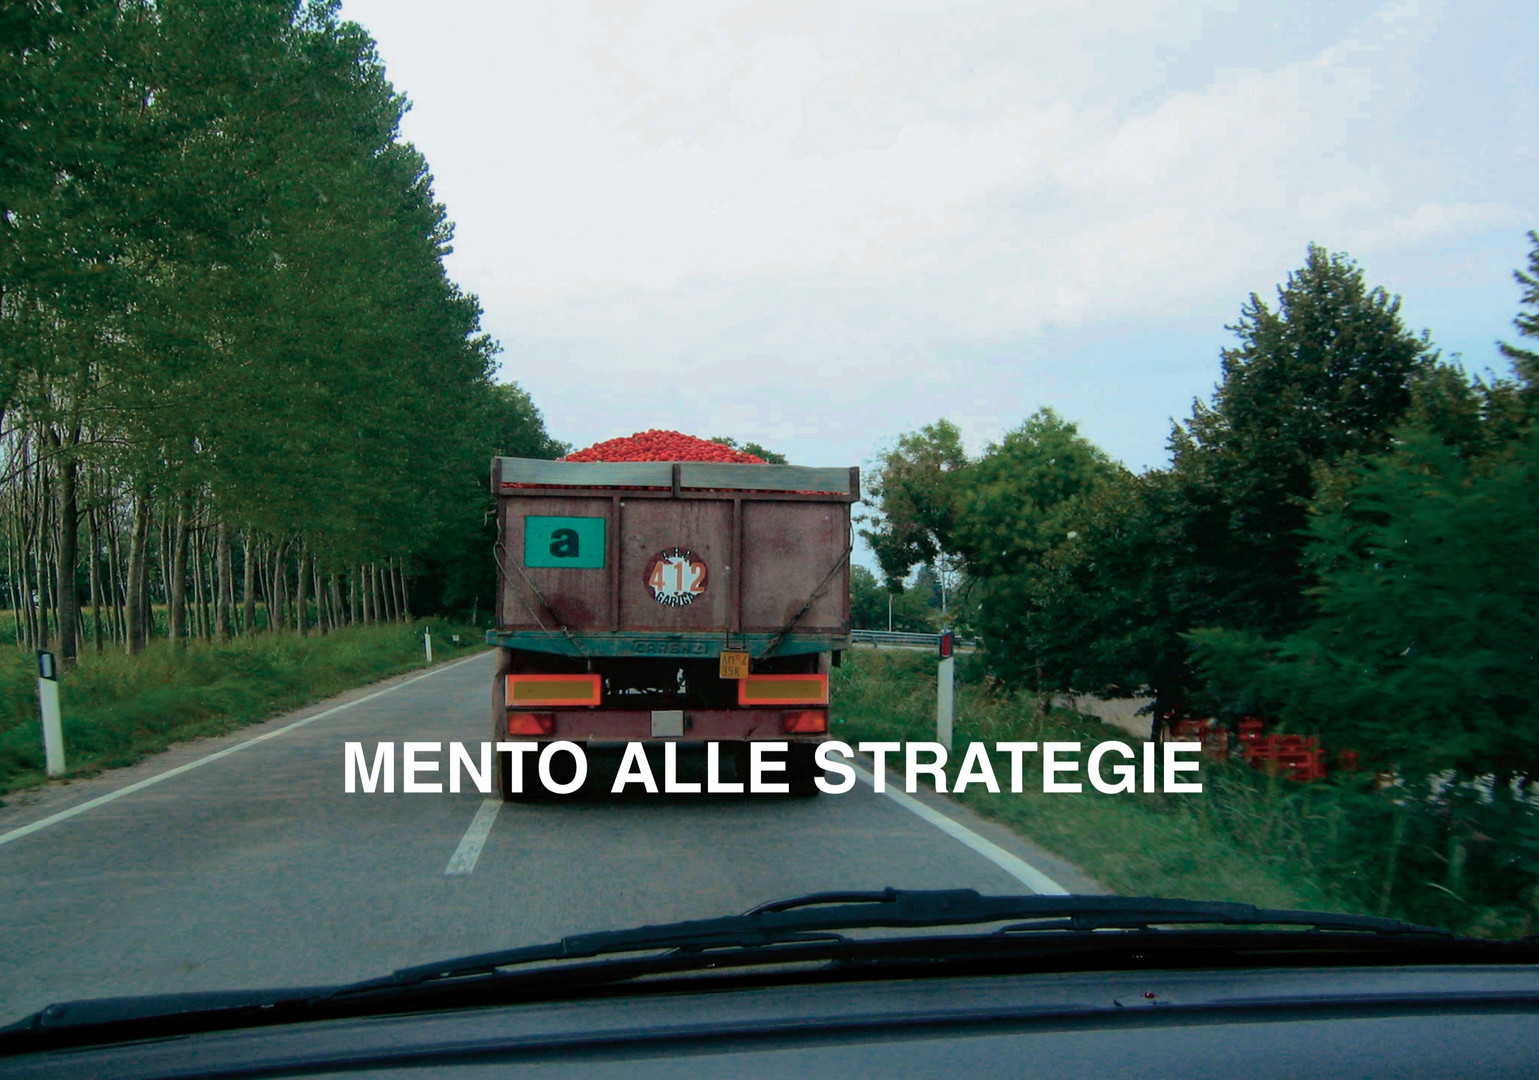 mento alle strategie